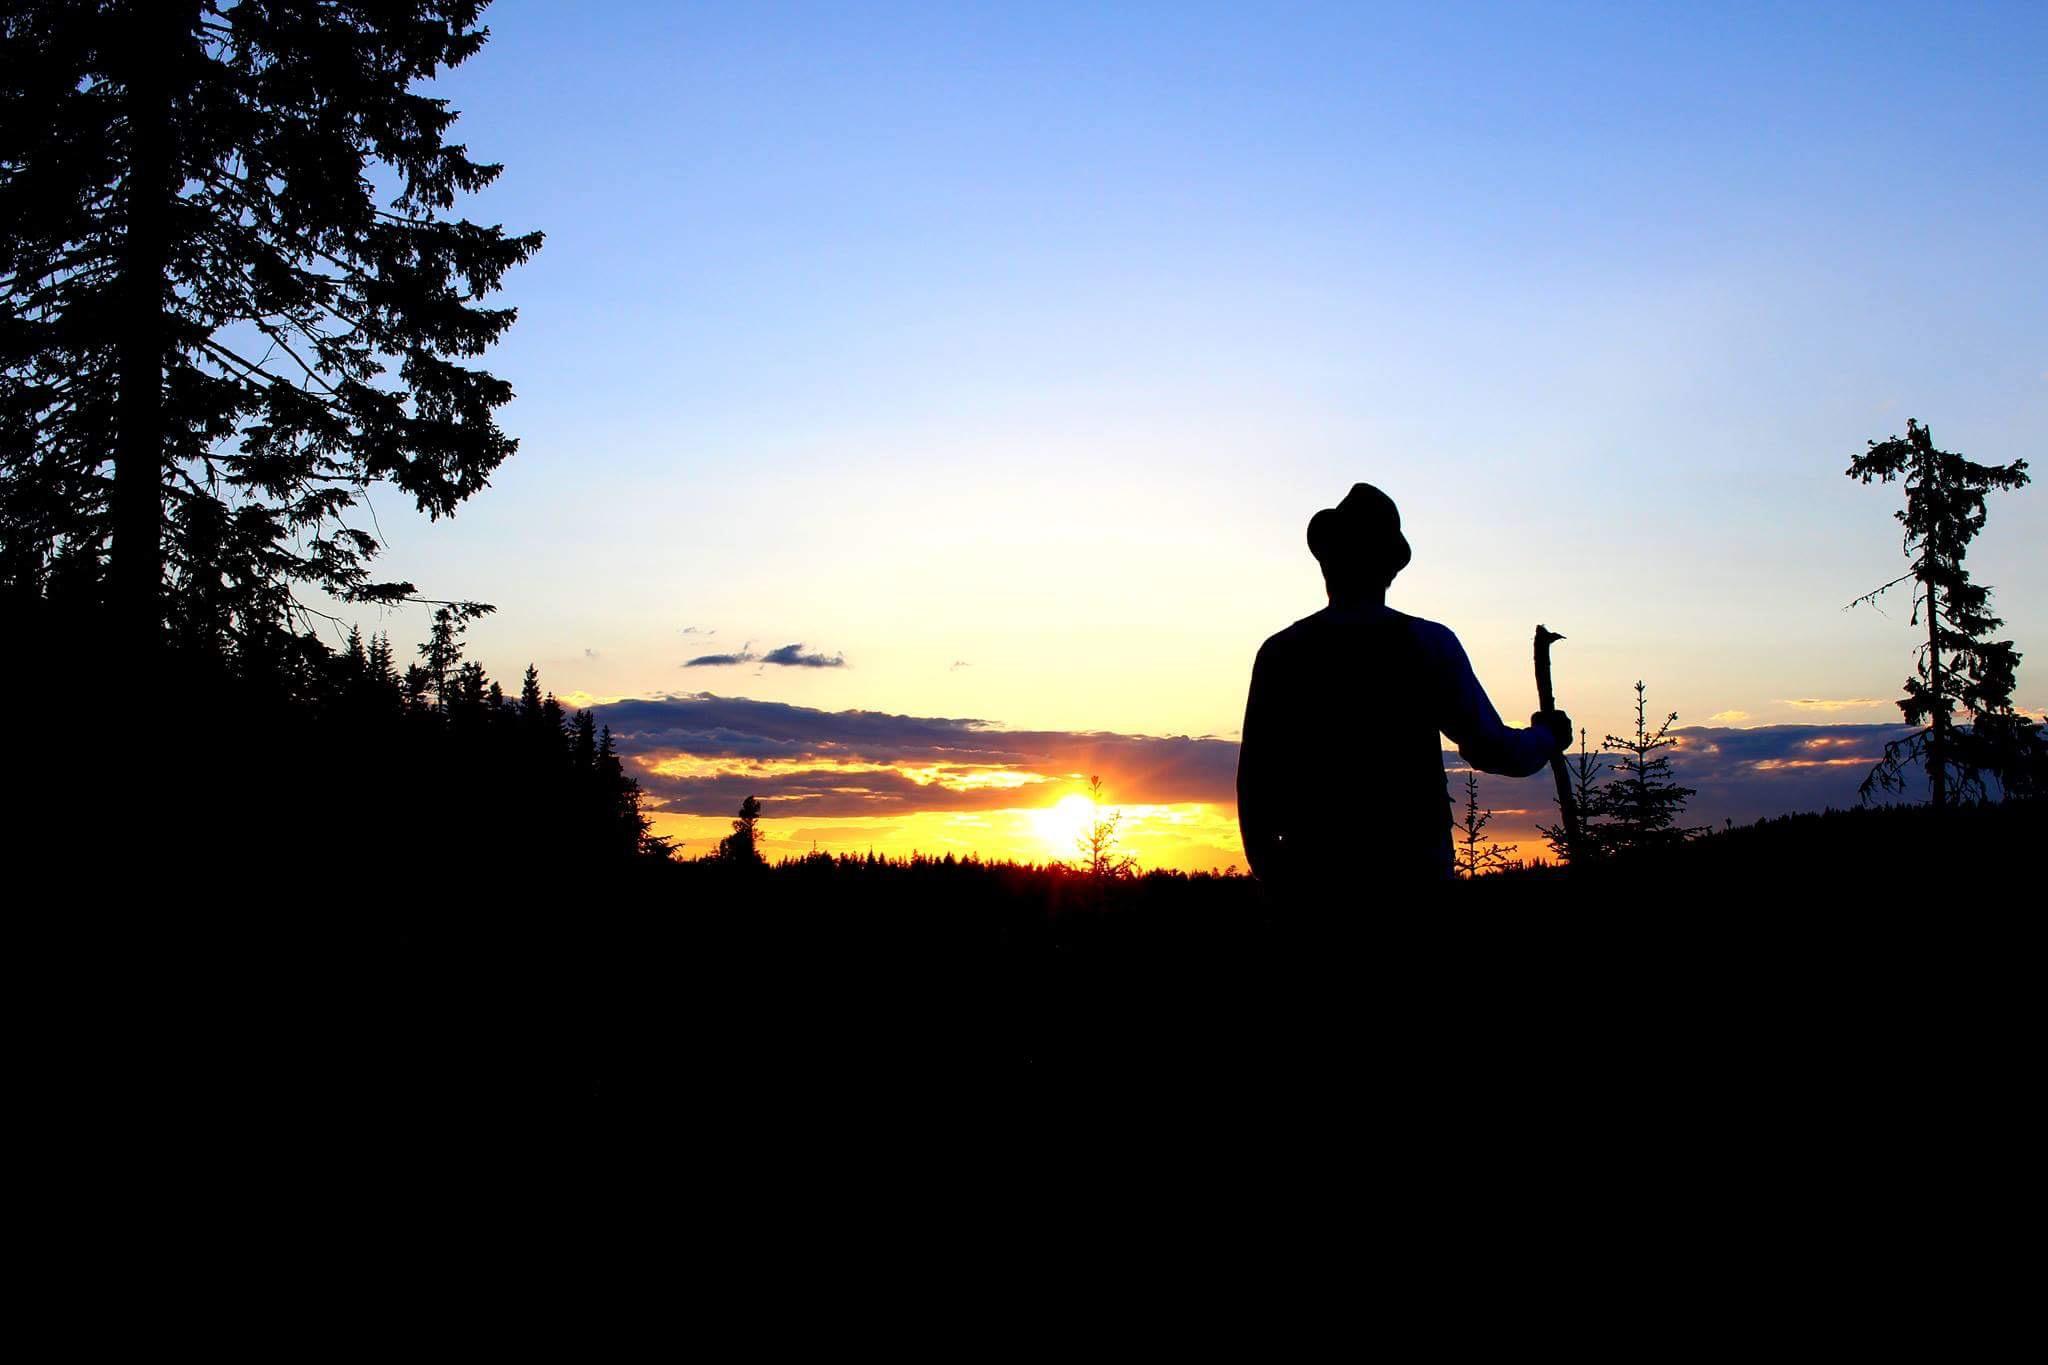 Solnedgang mot Rørmyra